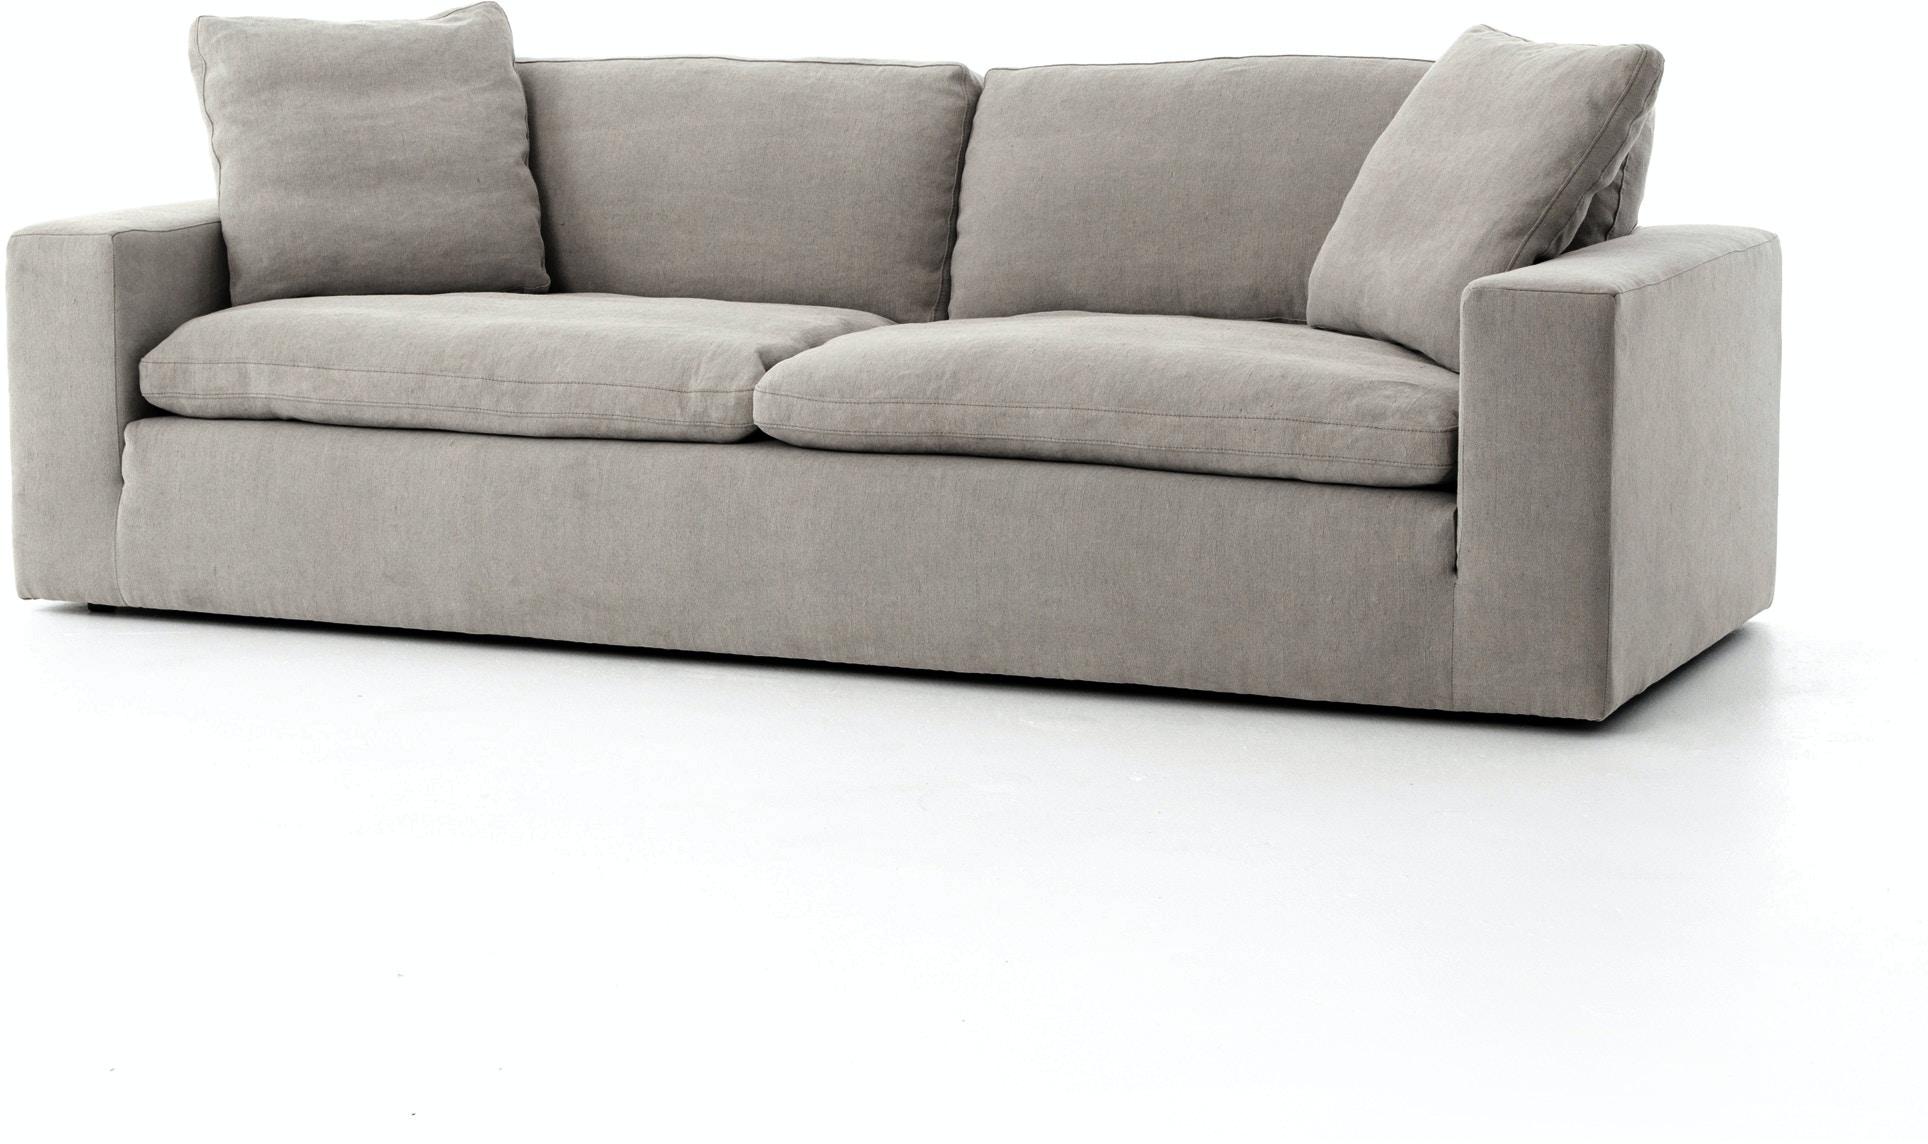 Four Hands Furniture CKEN K7 430 Living Room PLUME SOFA 96 inch